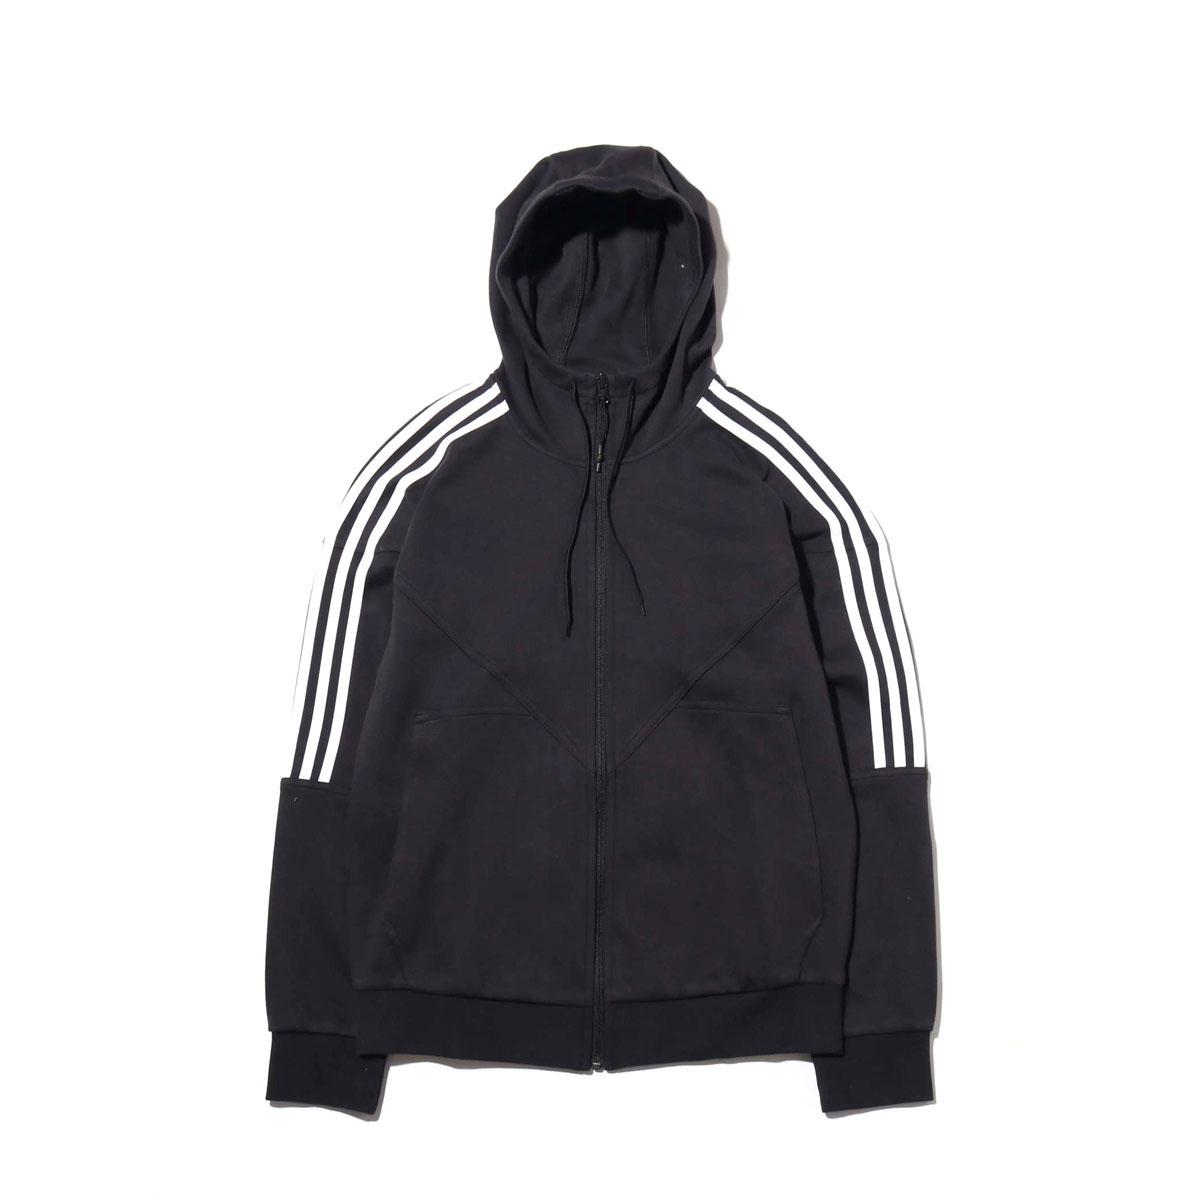 adidas Originals NMD FZ HOODIE(アディダス オリジナルス エヌエムディーFZフーディー)BLACK【メンズ パーカー】18FW-I